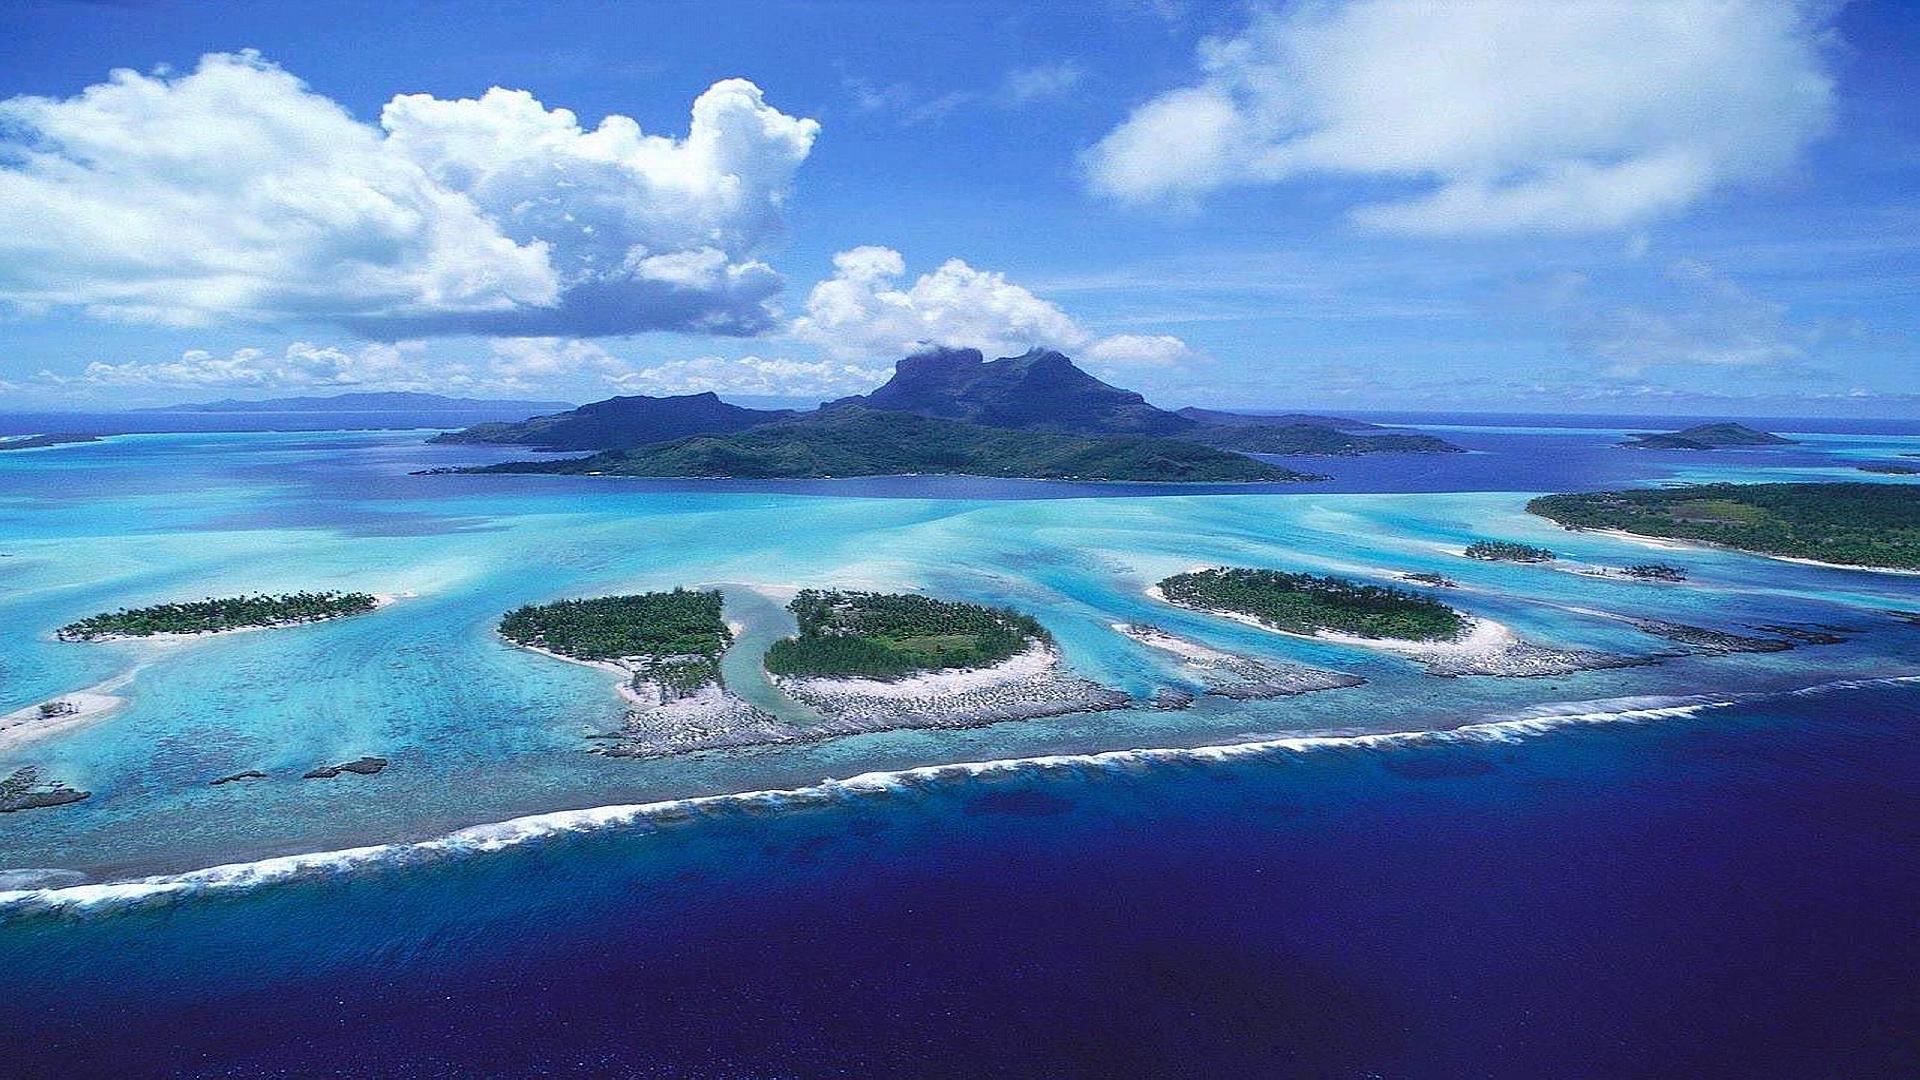 Tropical Paradise Beach Hd Wallpaper For Nexus 7 Screens: 2K Desktop Wallpapers